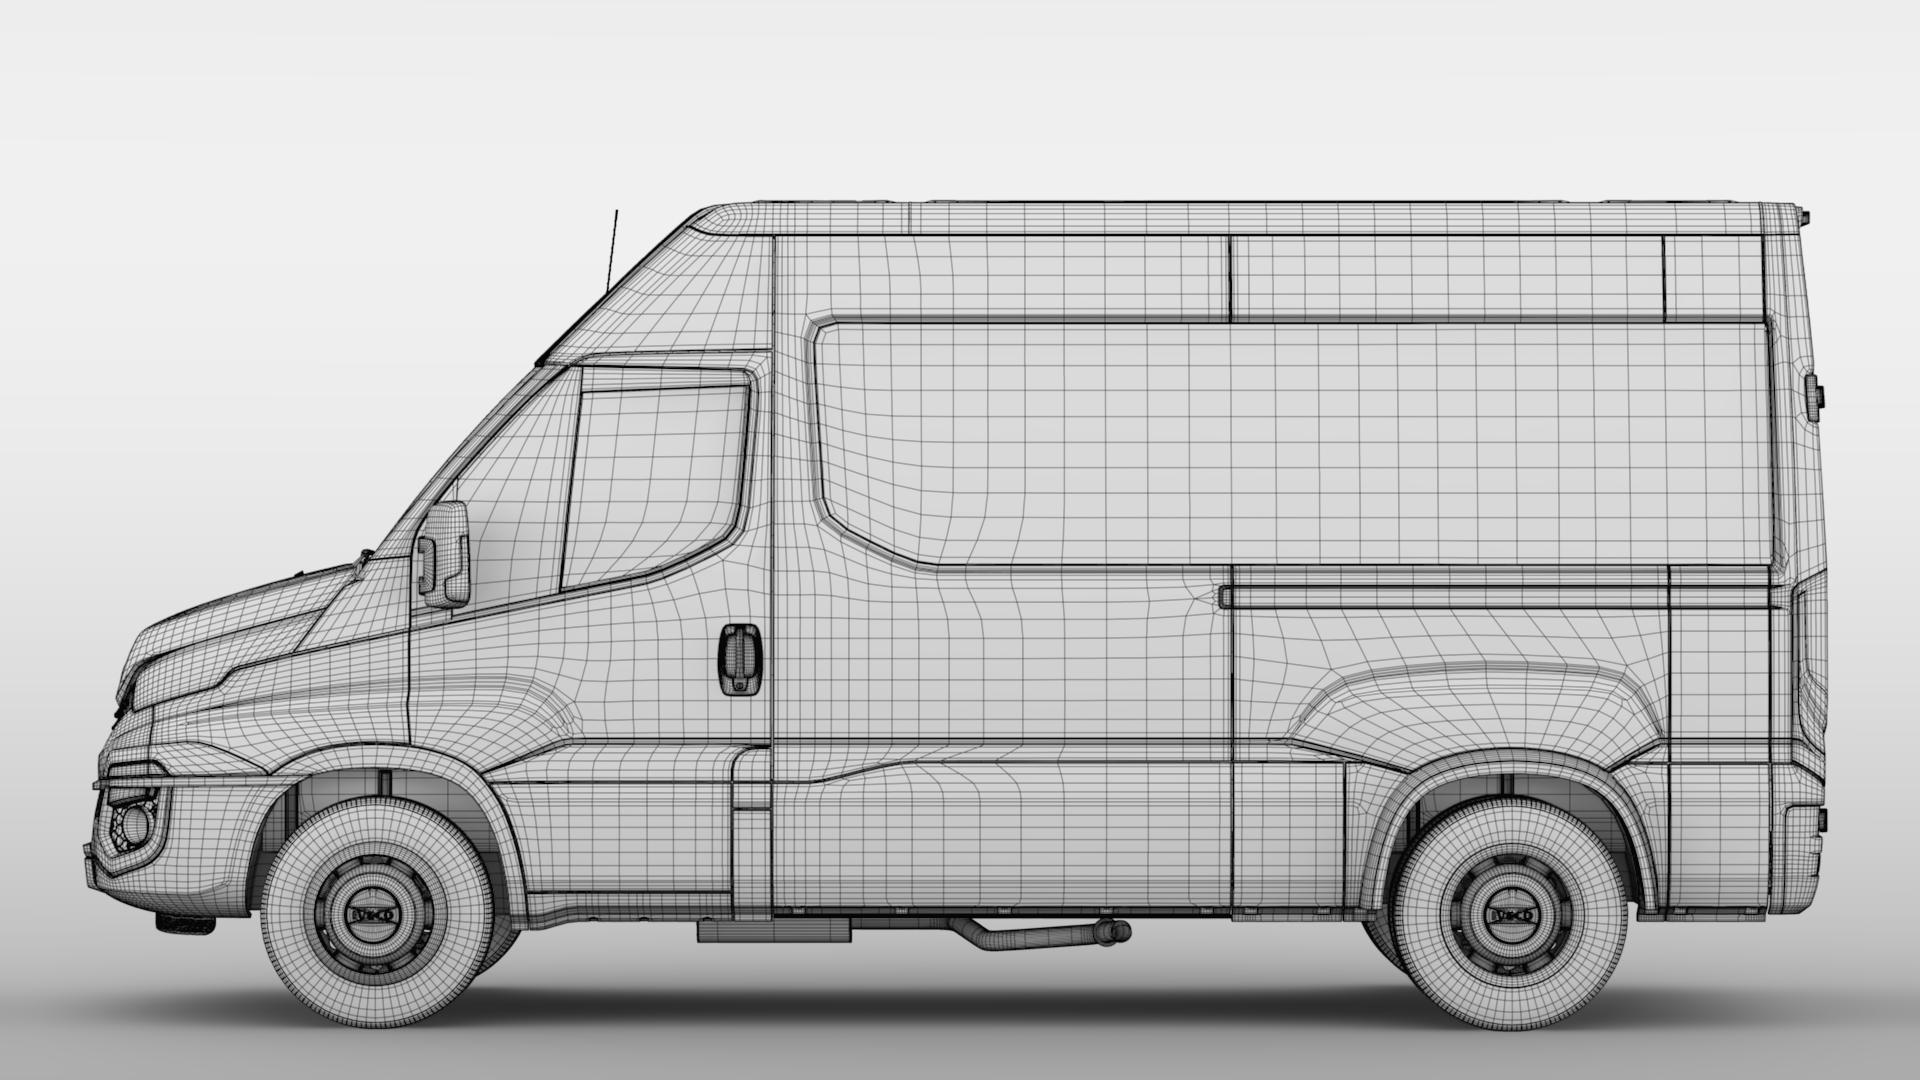 iveco daily minibus l2h2 2017 3d model max fbx c4d lwo ma mb hrc xsi obj 276029